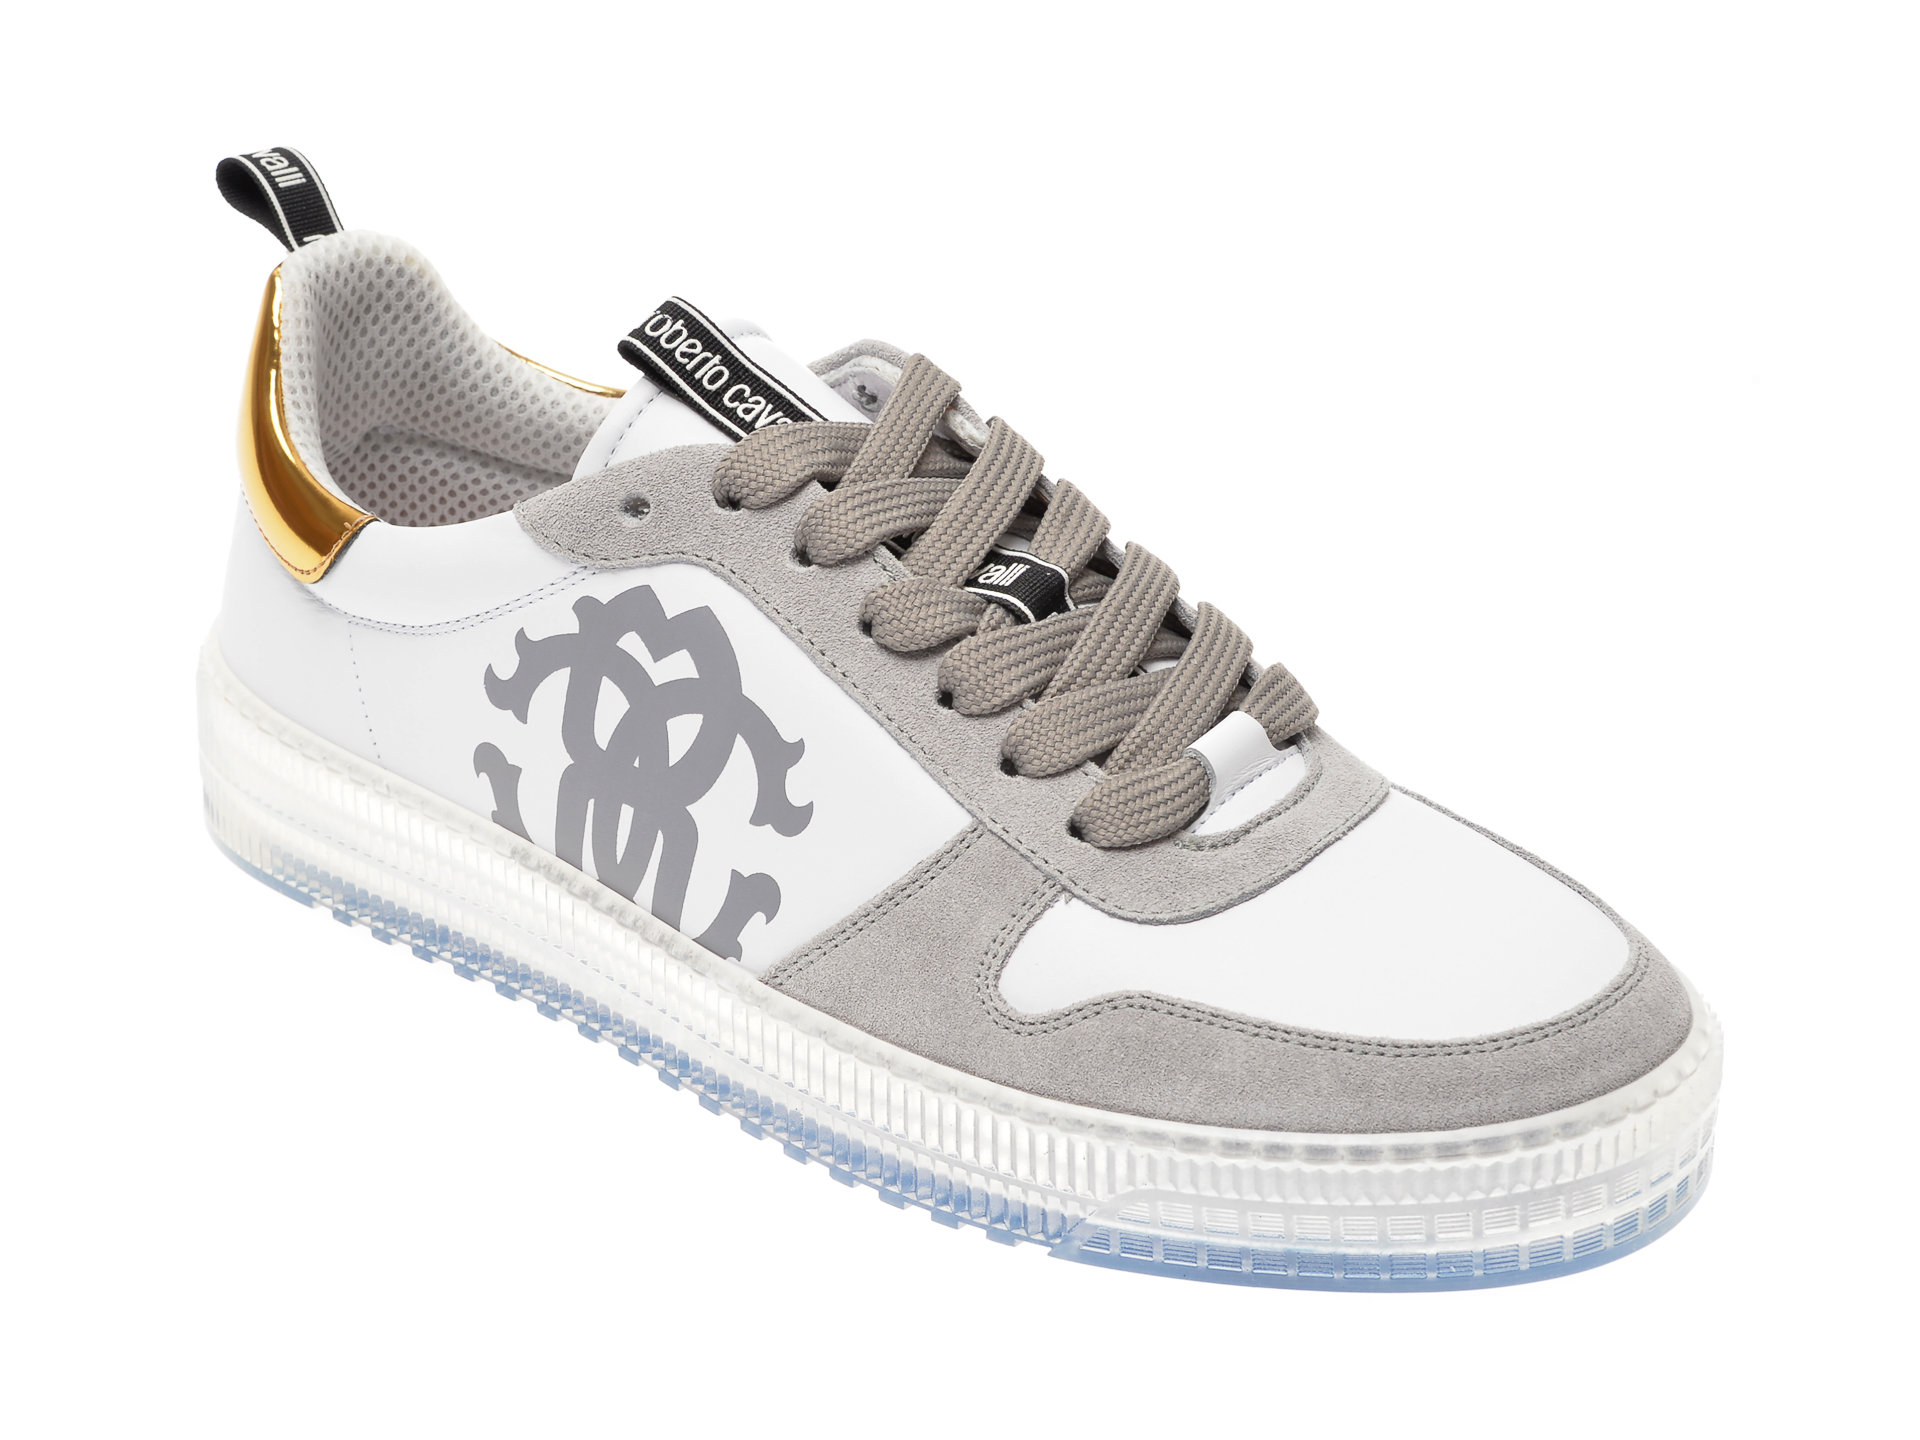 Pantofi ROBERTO CAVALLI gri, 1088RZ, din piele naturala